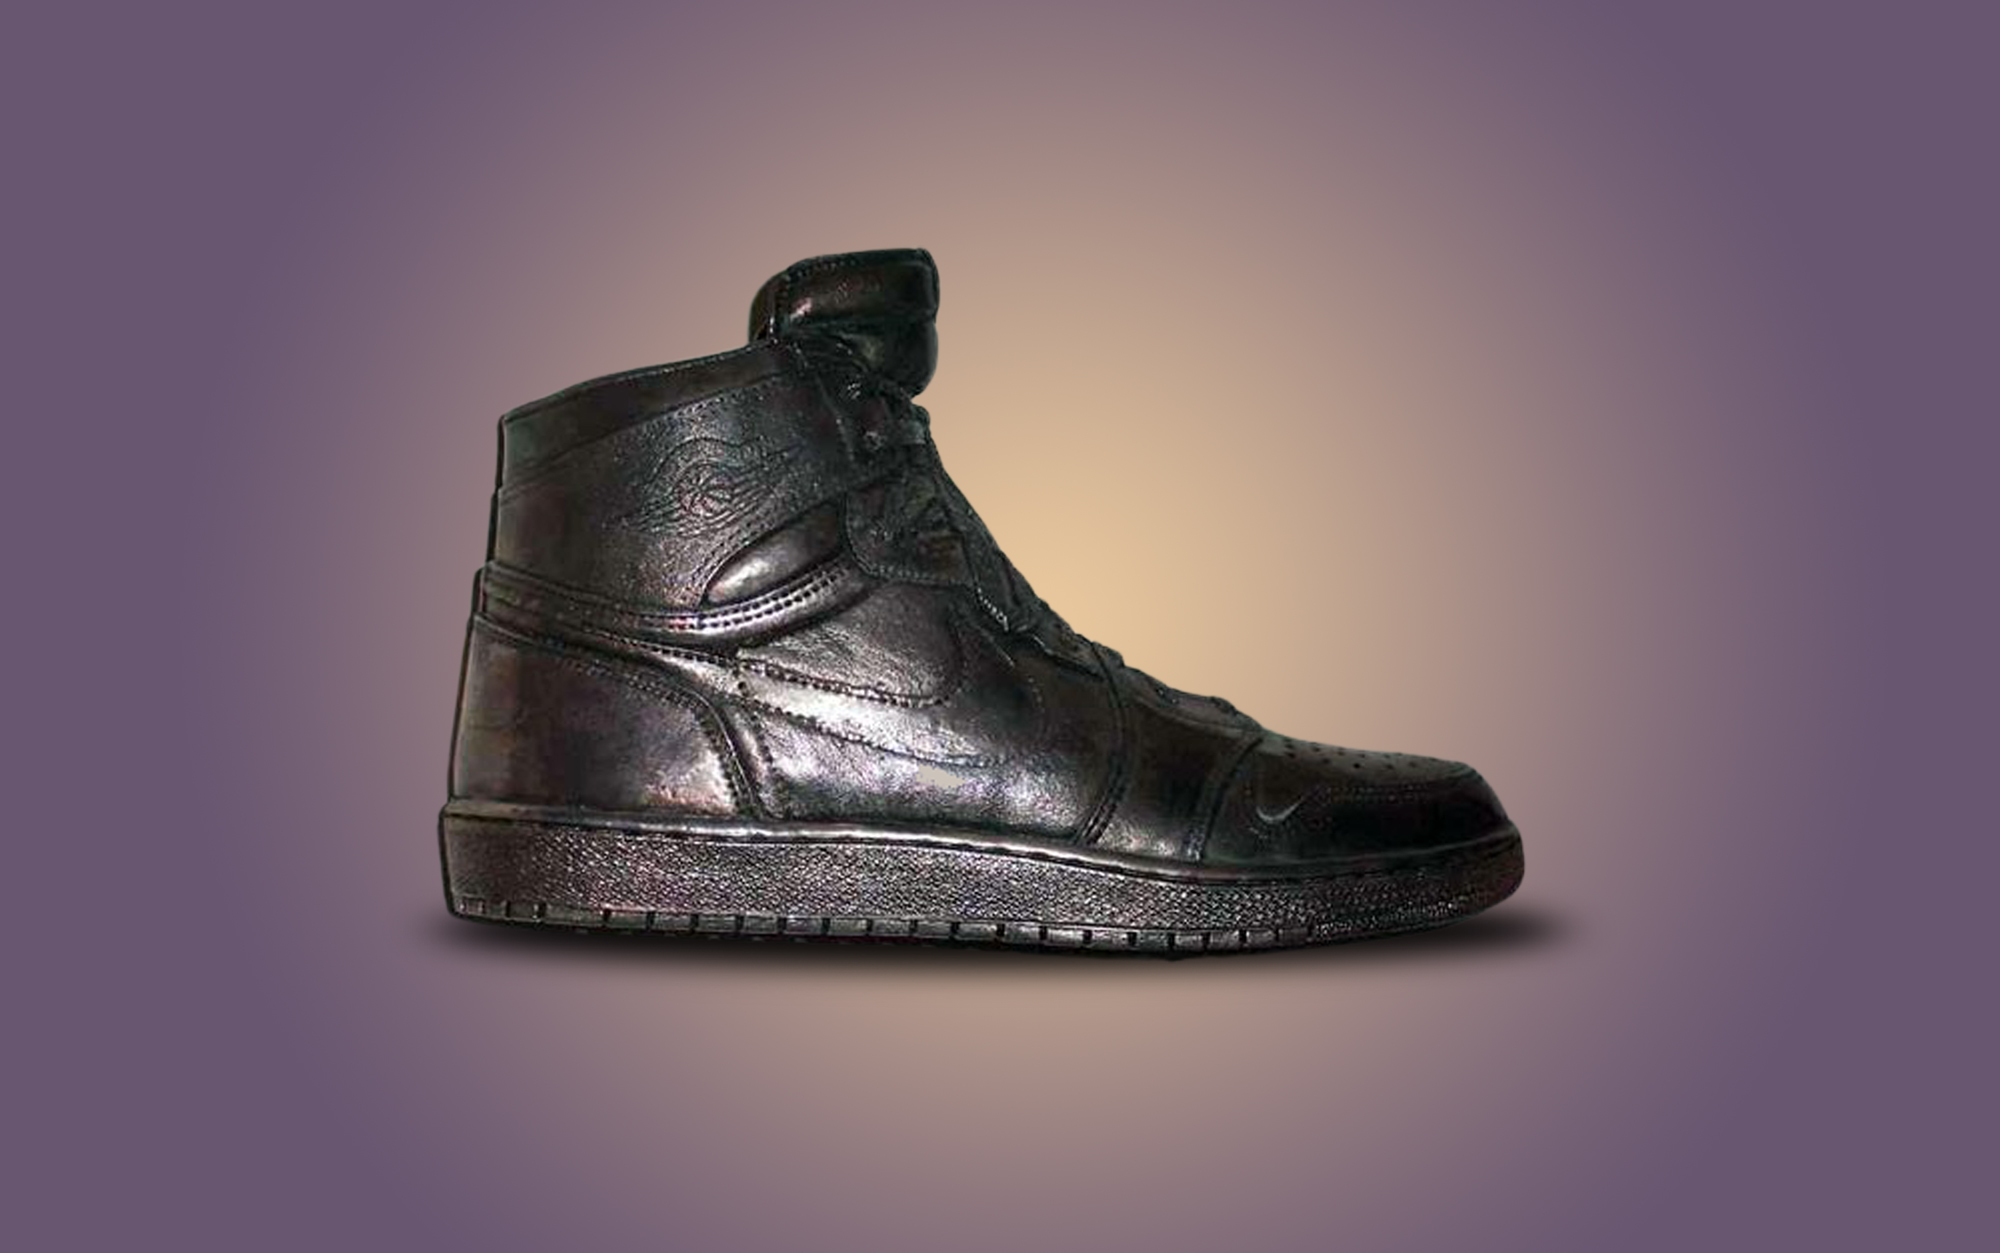 Air Jordan Silver Shoes - $60,000   GODLY SOLES